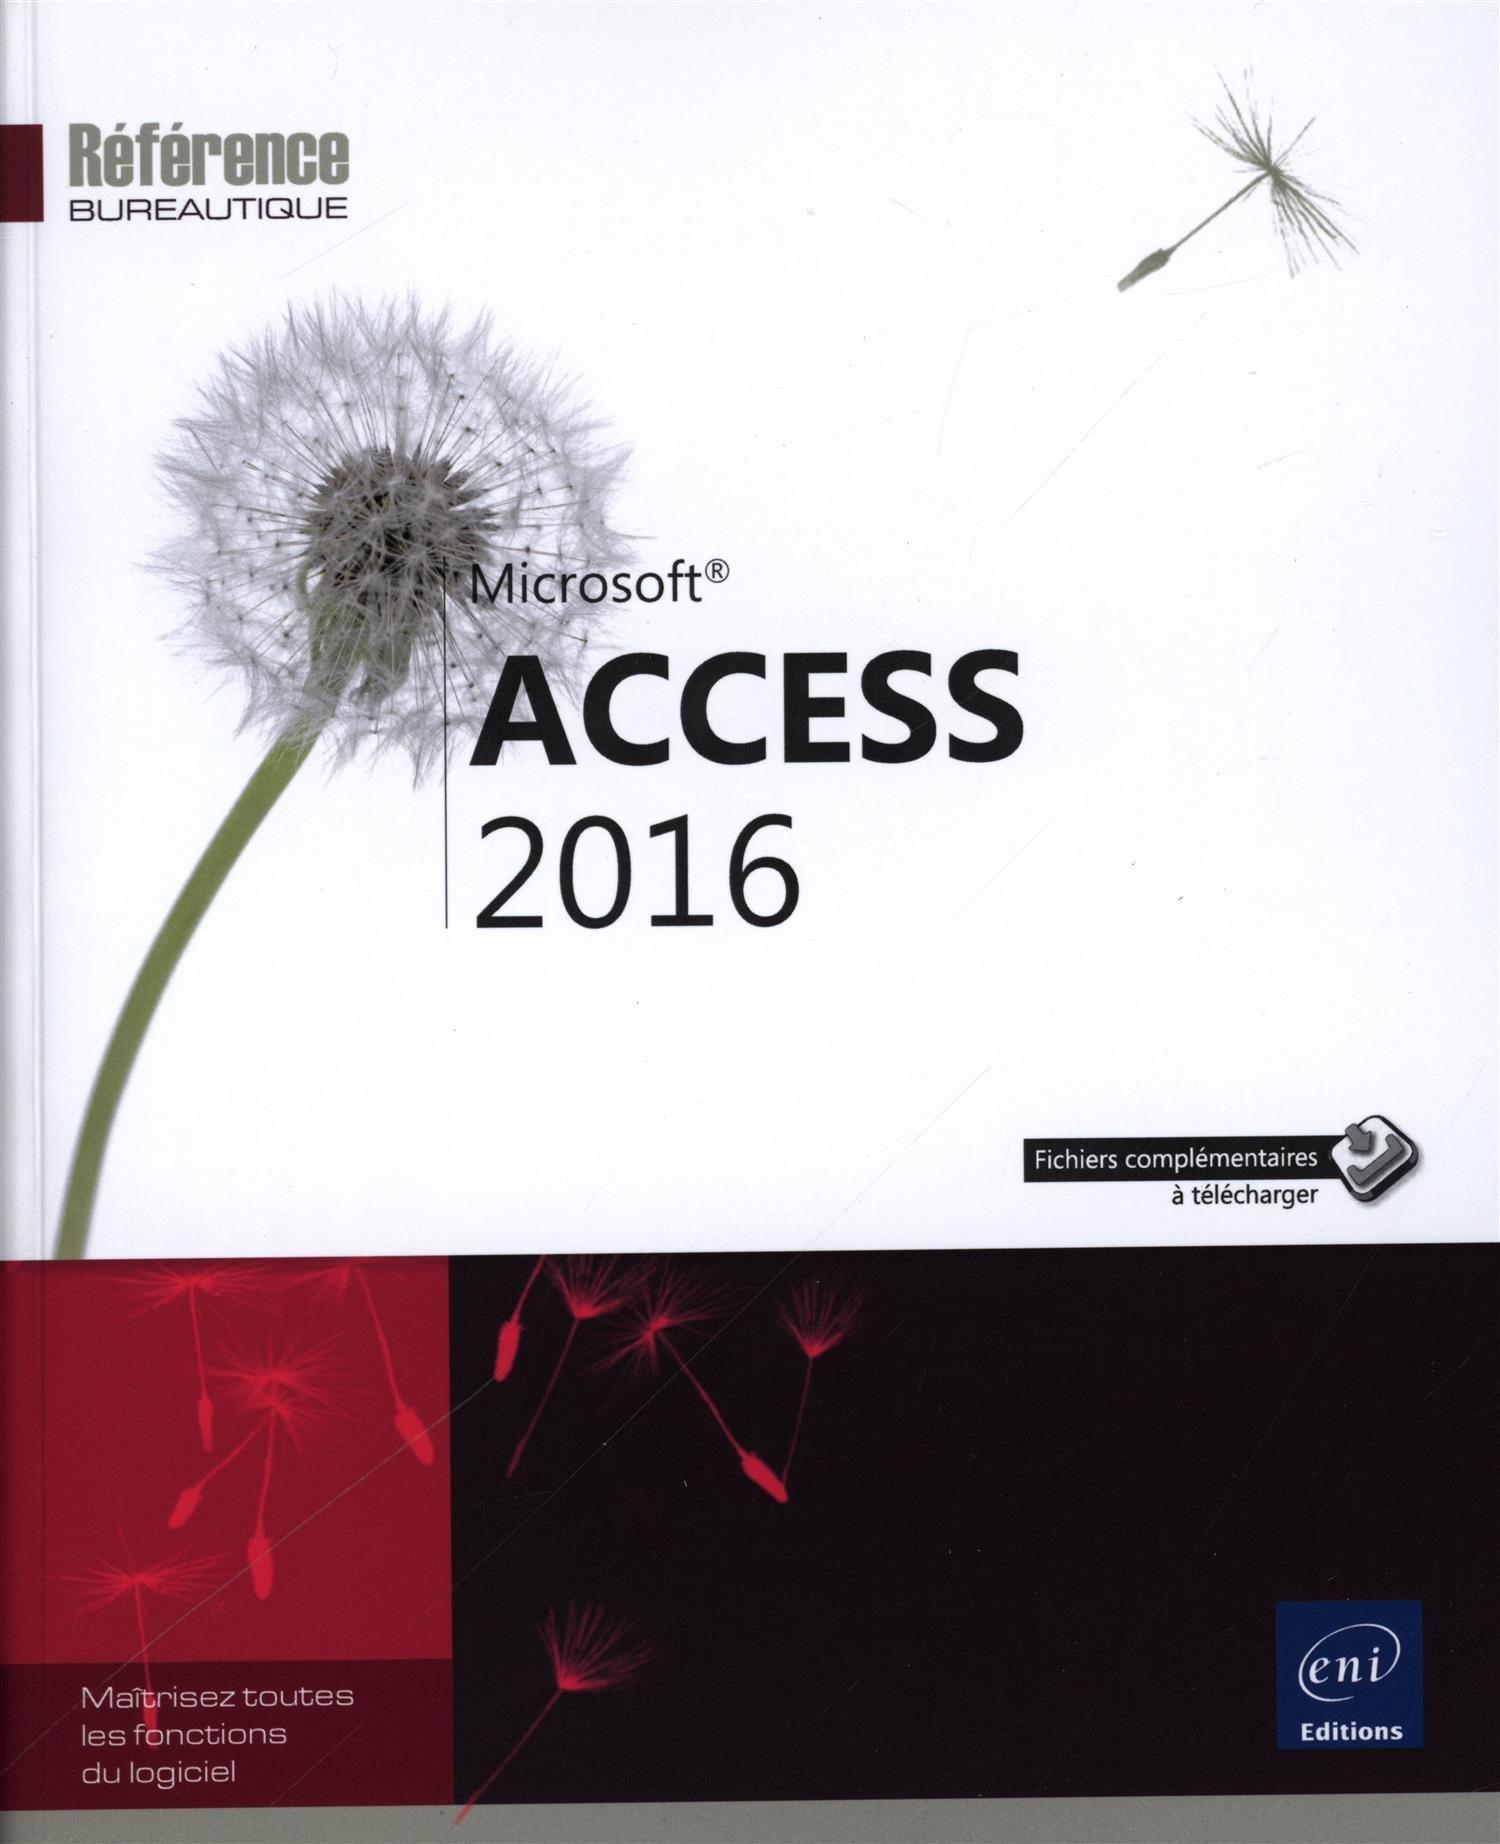 Access 2016 Broché – 13 avril 2016 Collectif Editions ENI 2409000622 Progiciels